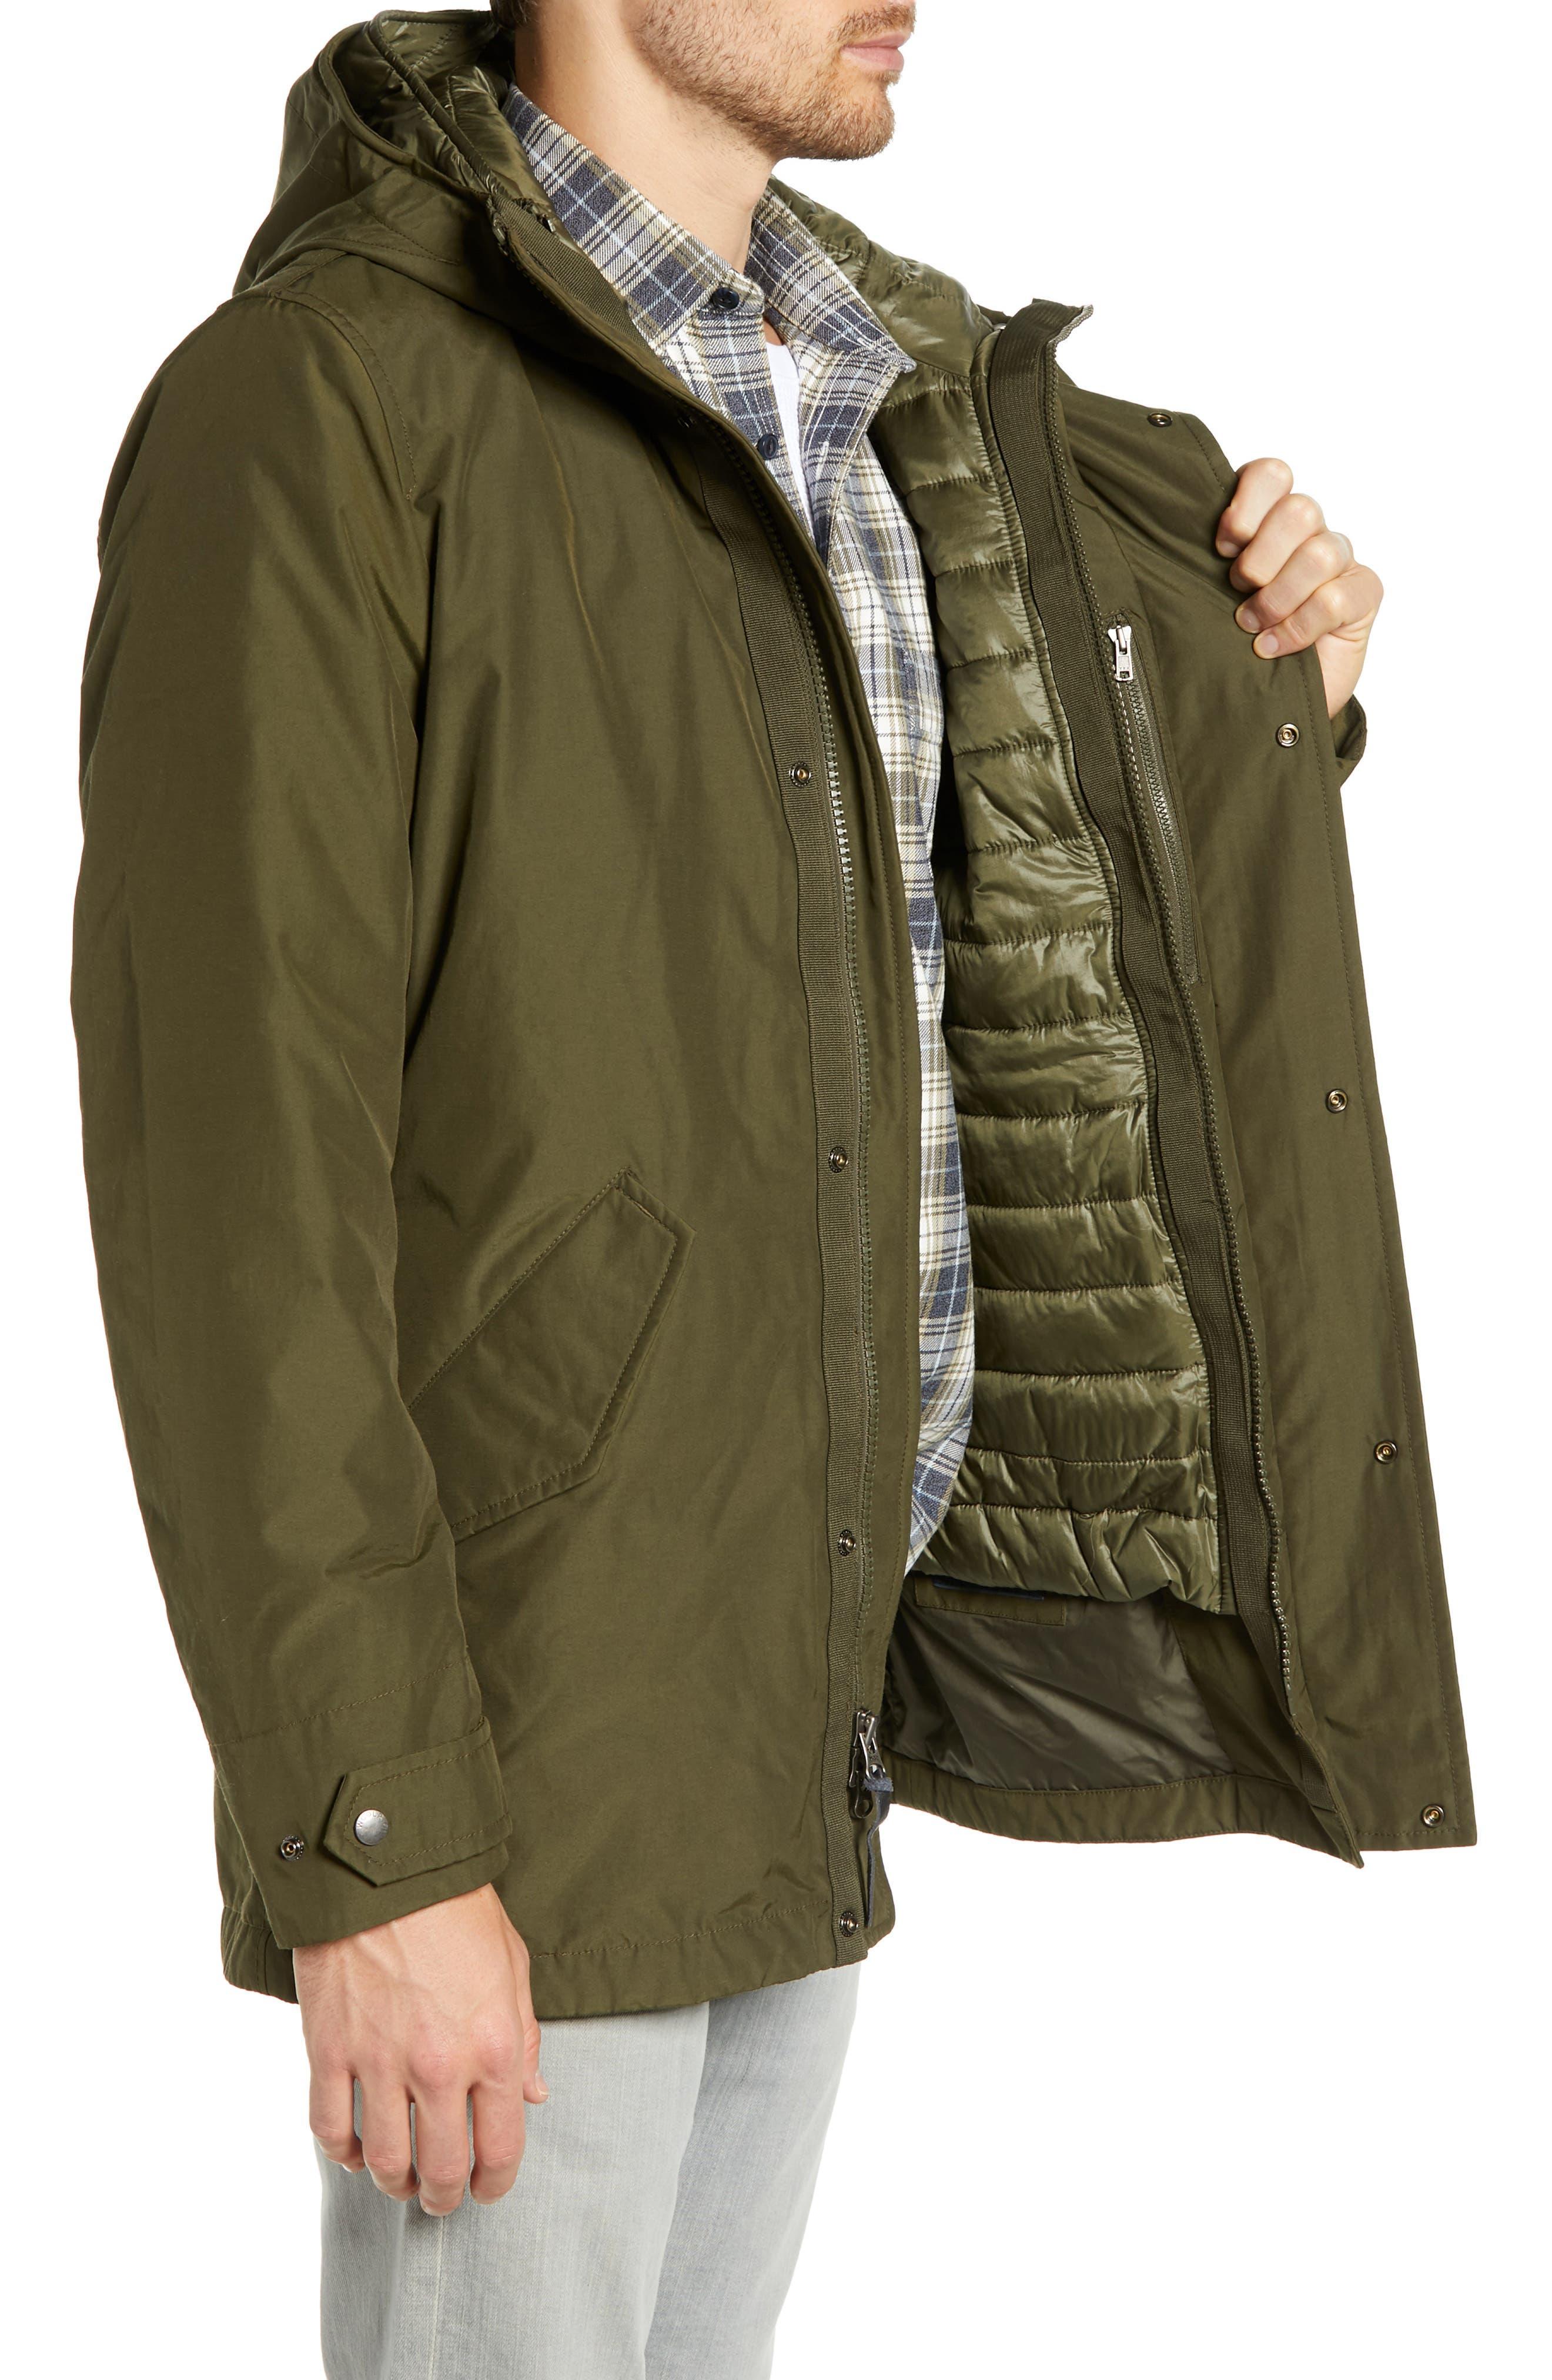 John Rich 'Long Military Eskimo' 3-in-1 Hooded Jacket,                             Alternate thumbnail 4, color,                             FLINT OLIVE